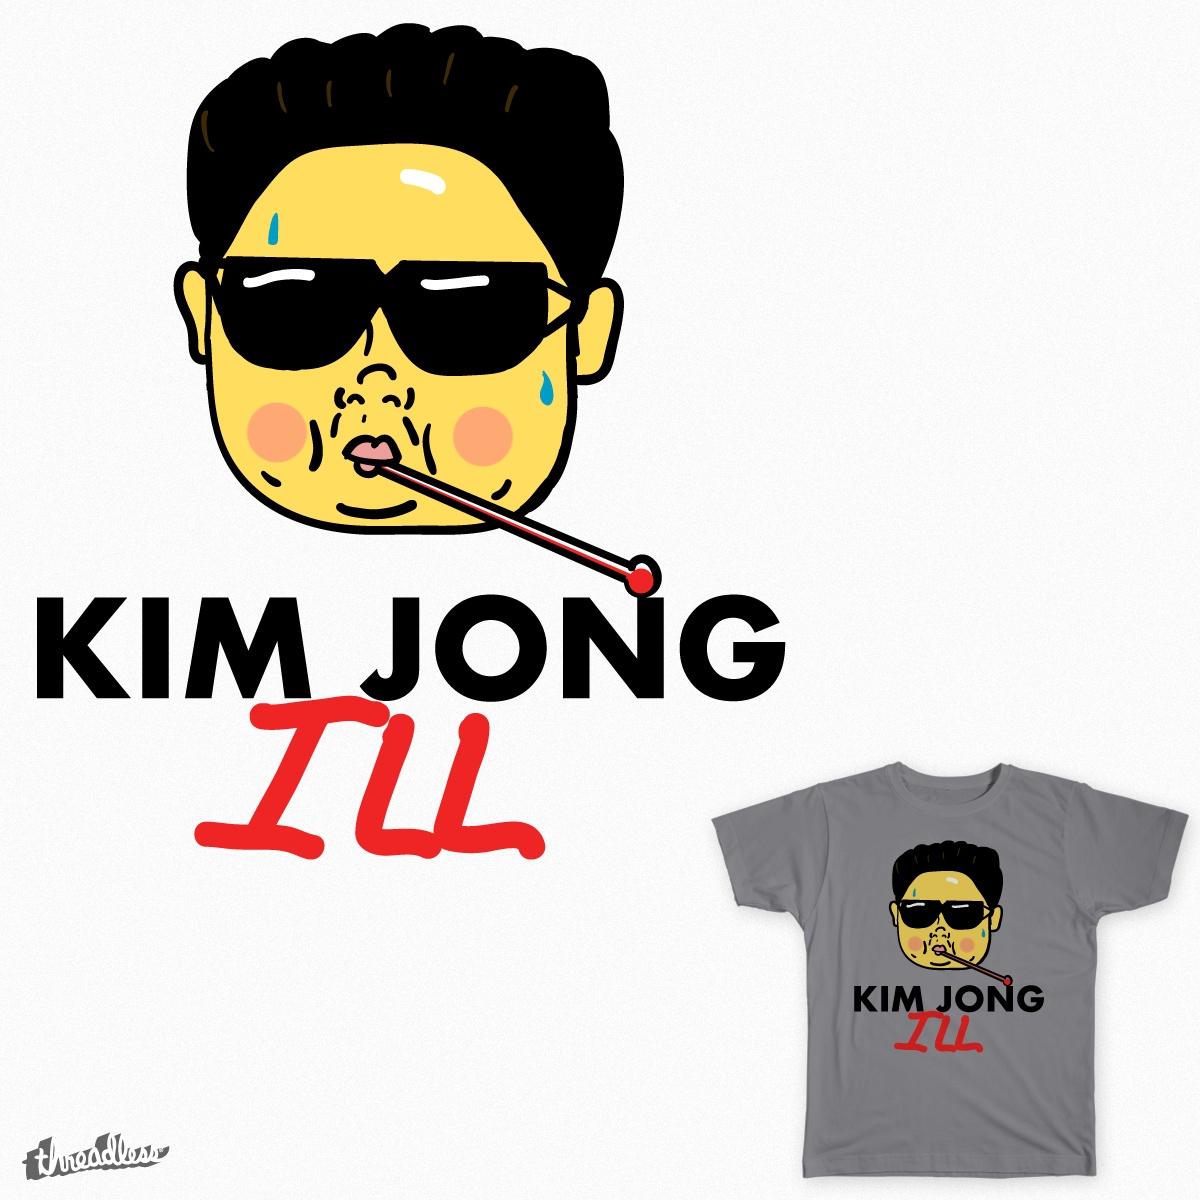 Kim Jong ILL by Nahanyiddee on Threadless